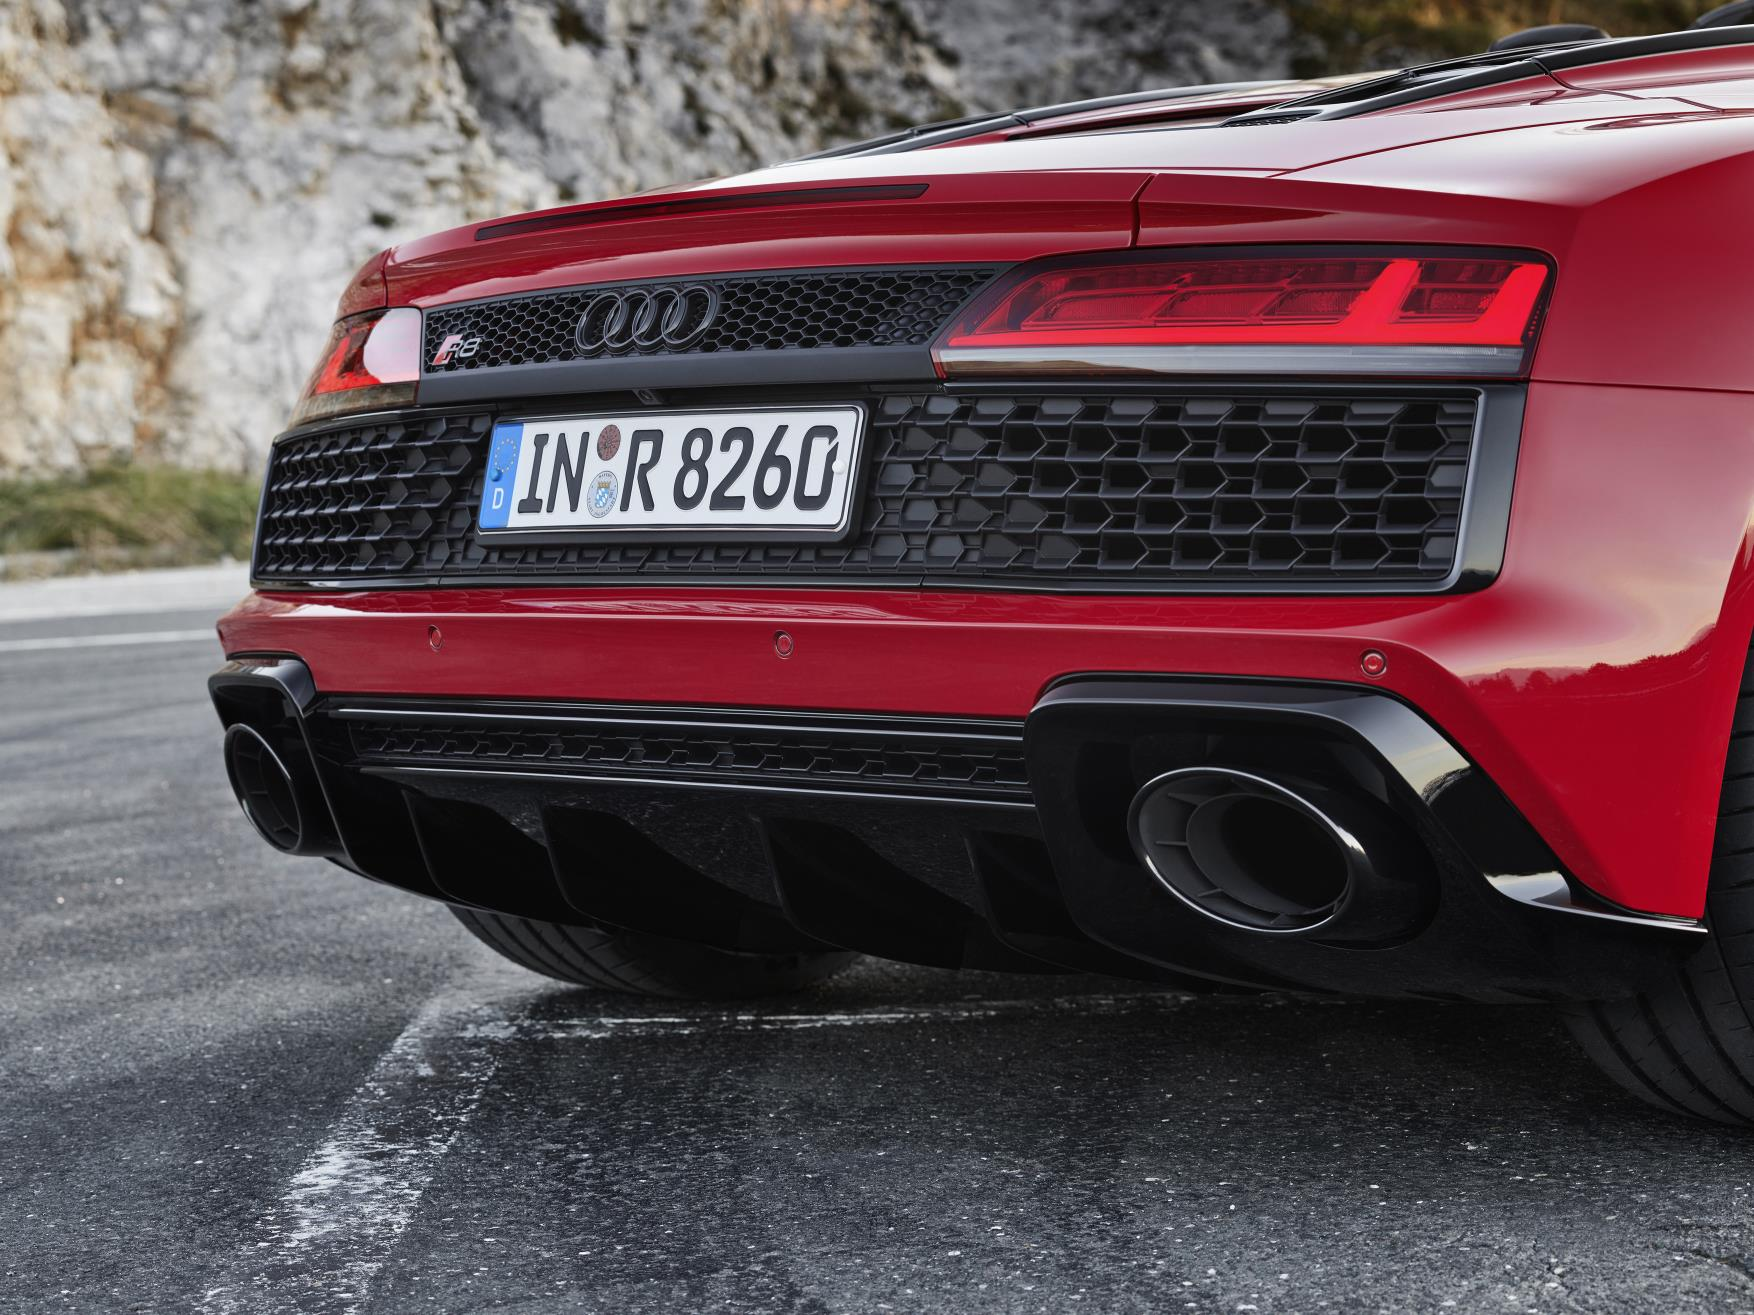 2020 Audi R8 RWD Spyder Exhaust